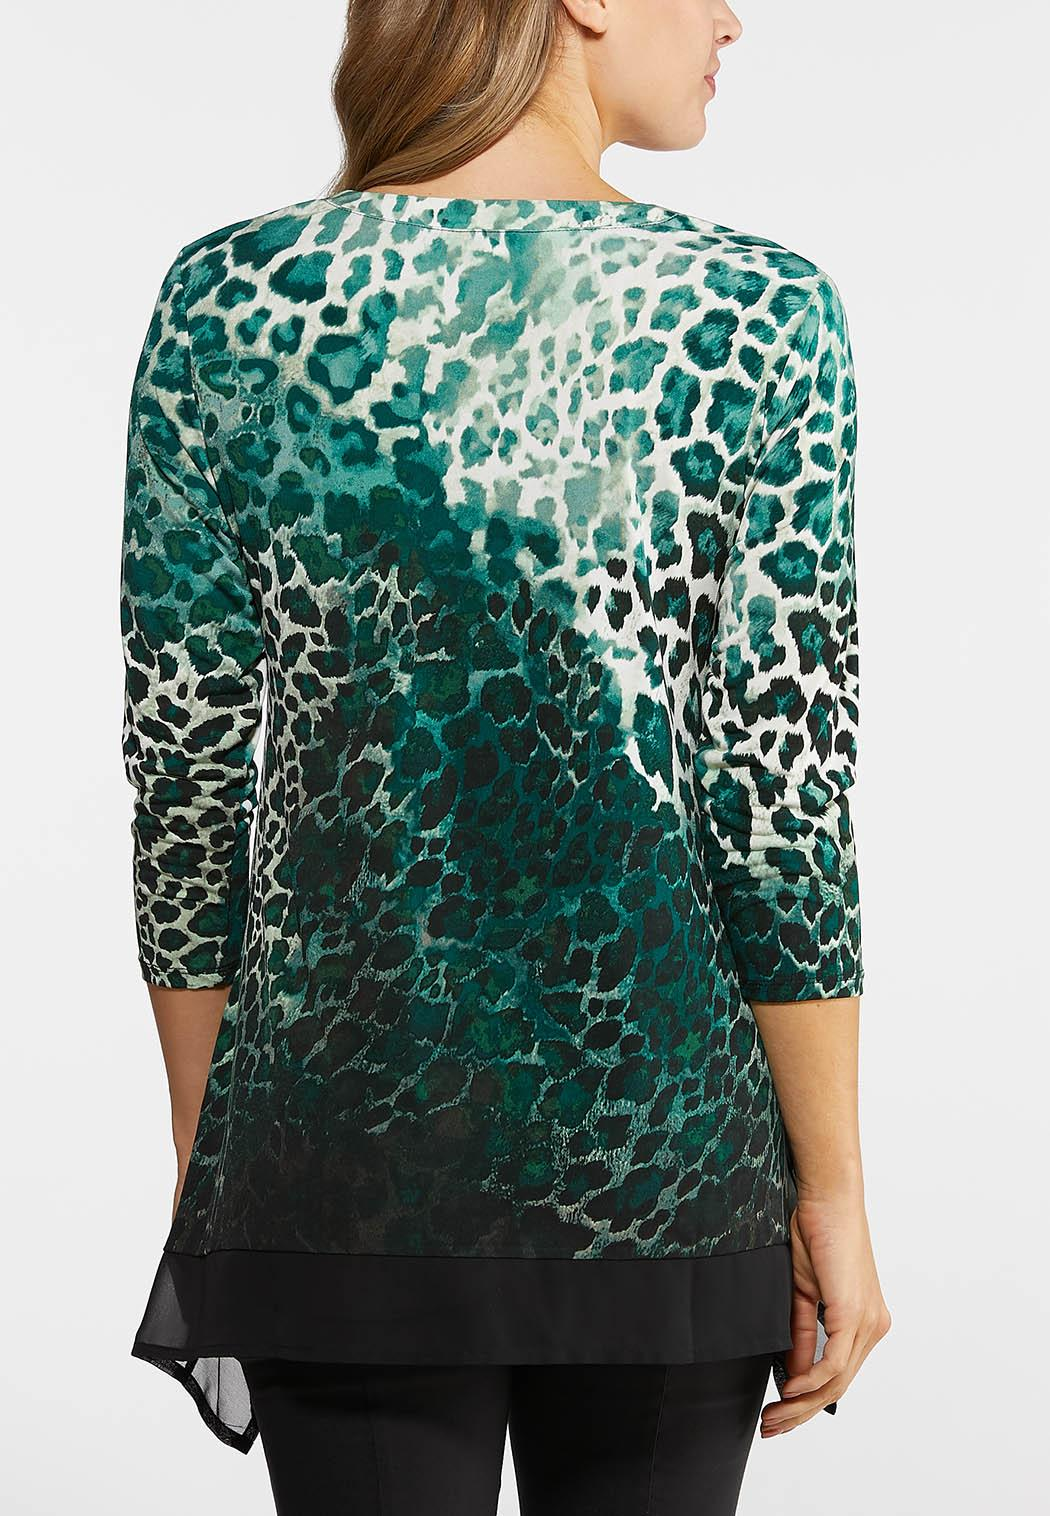 Green Leopard Print Top (Item #44048351)